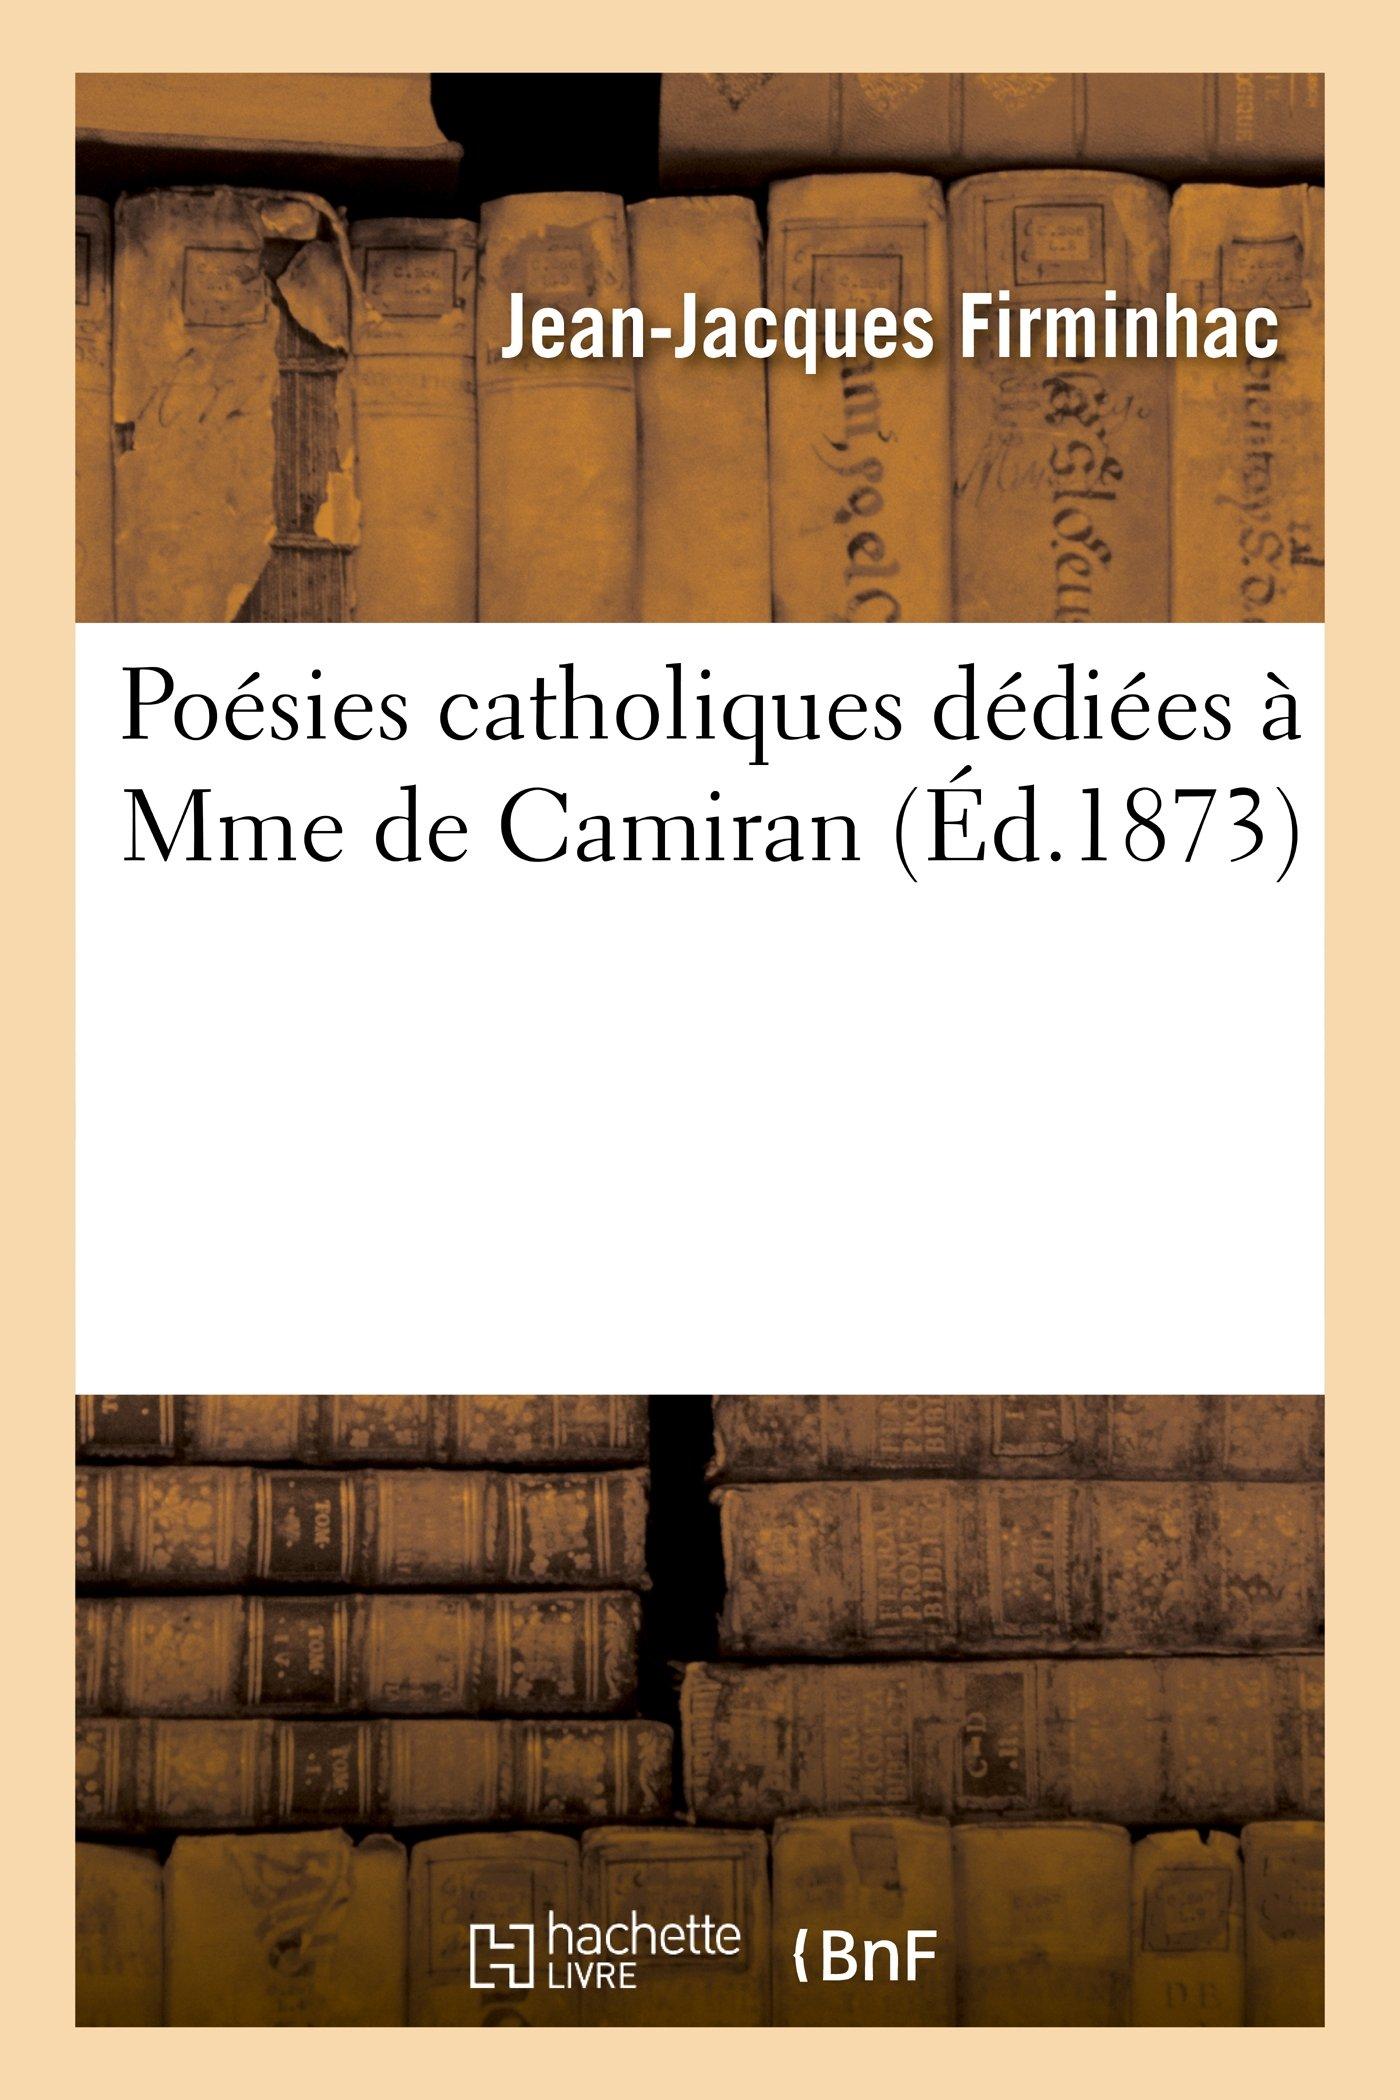 Download Poesies Catholiques Dediees a Mme de Camiran (Litterature) (French Edition) ebook